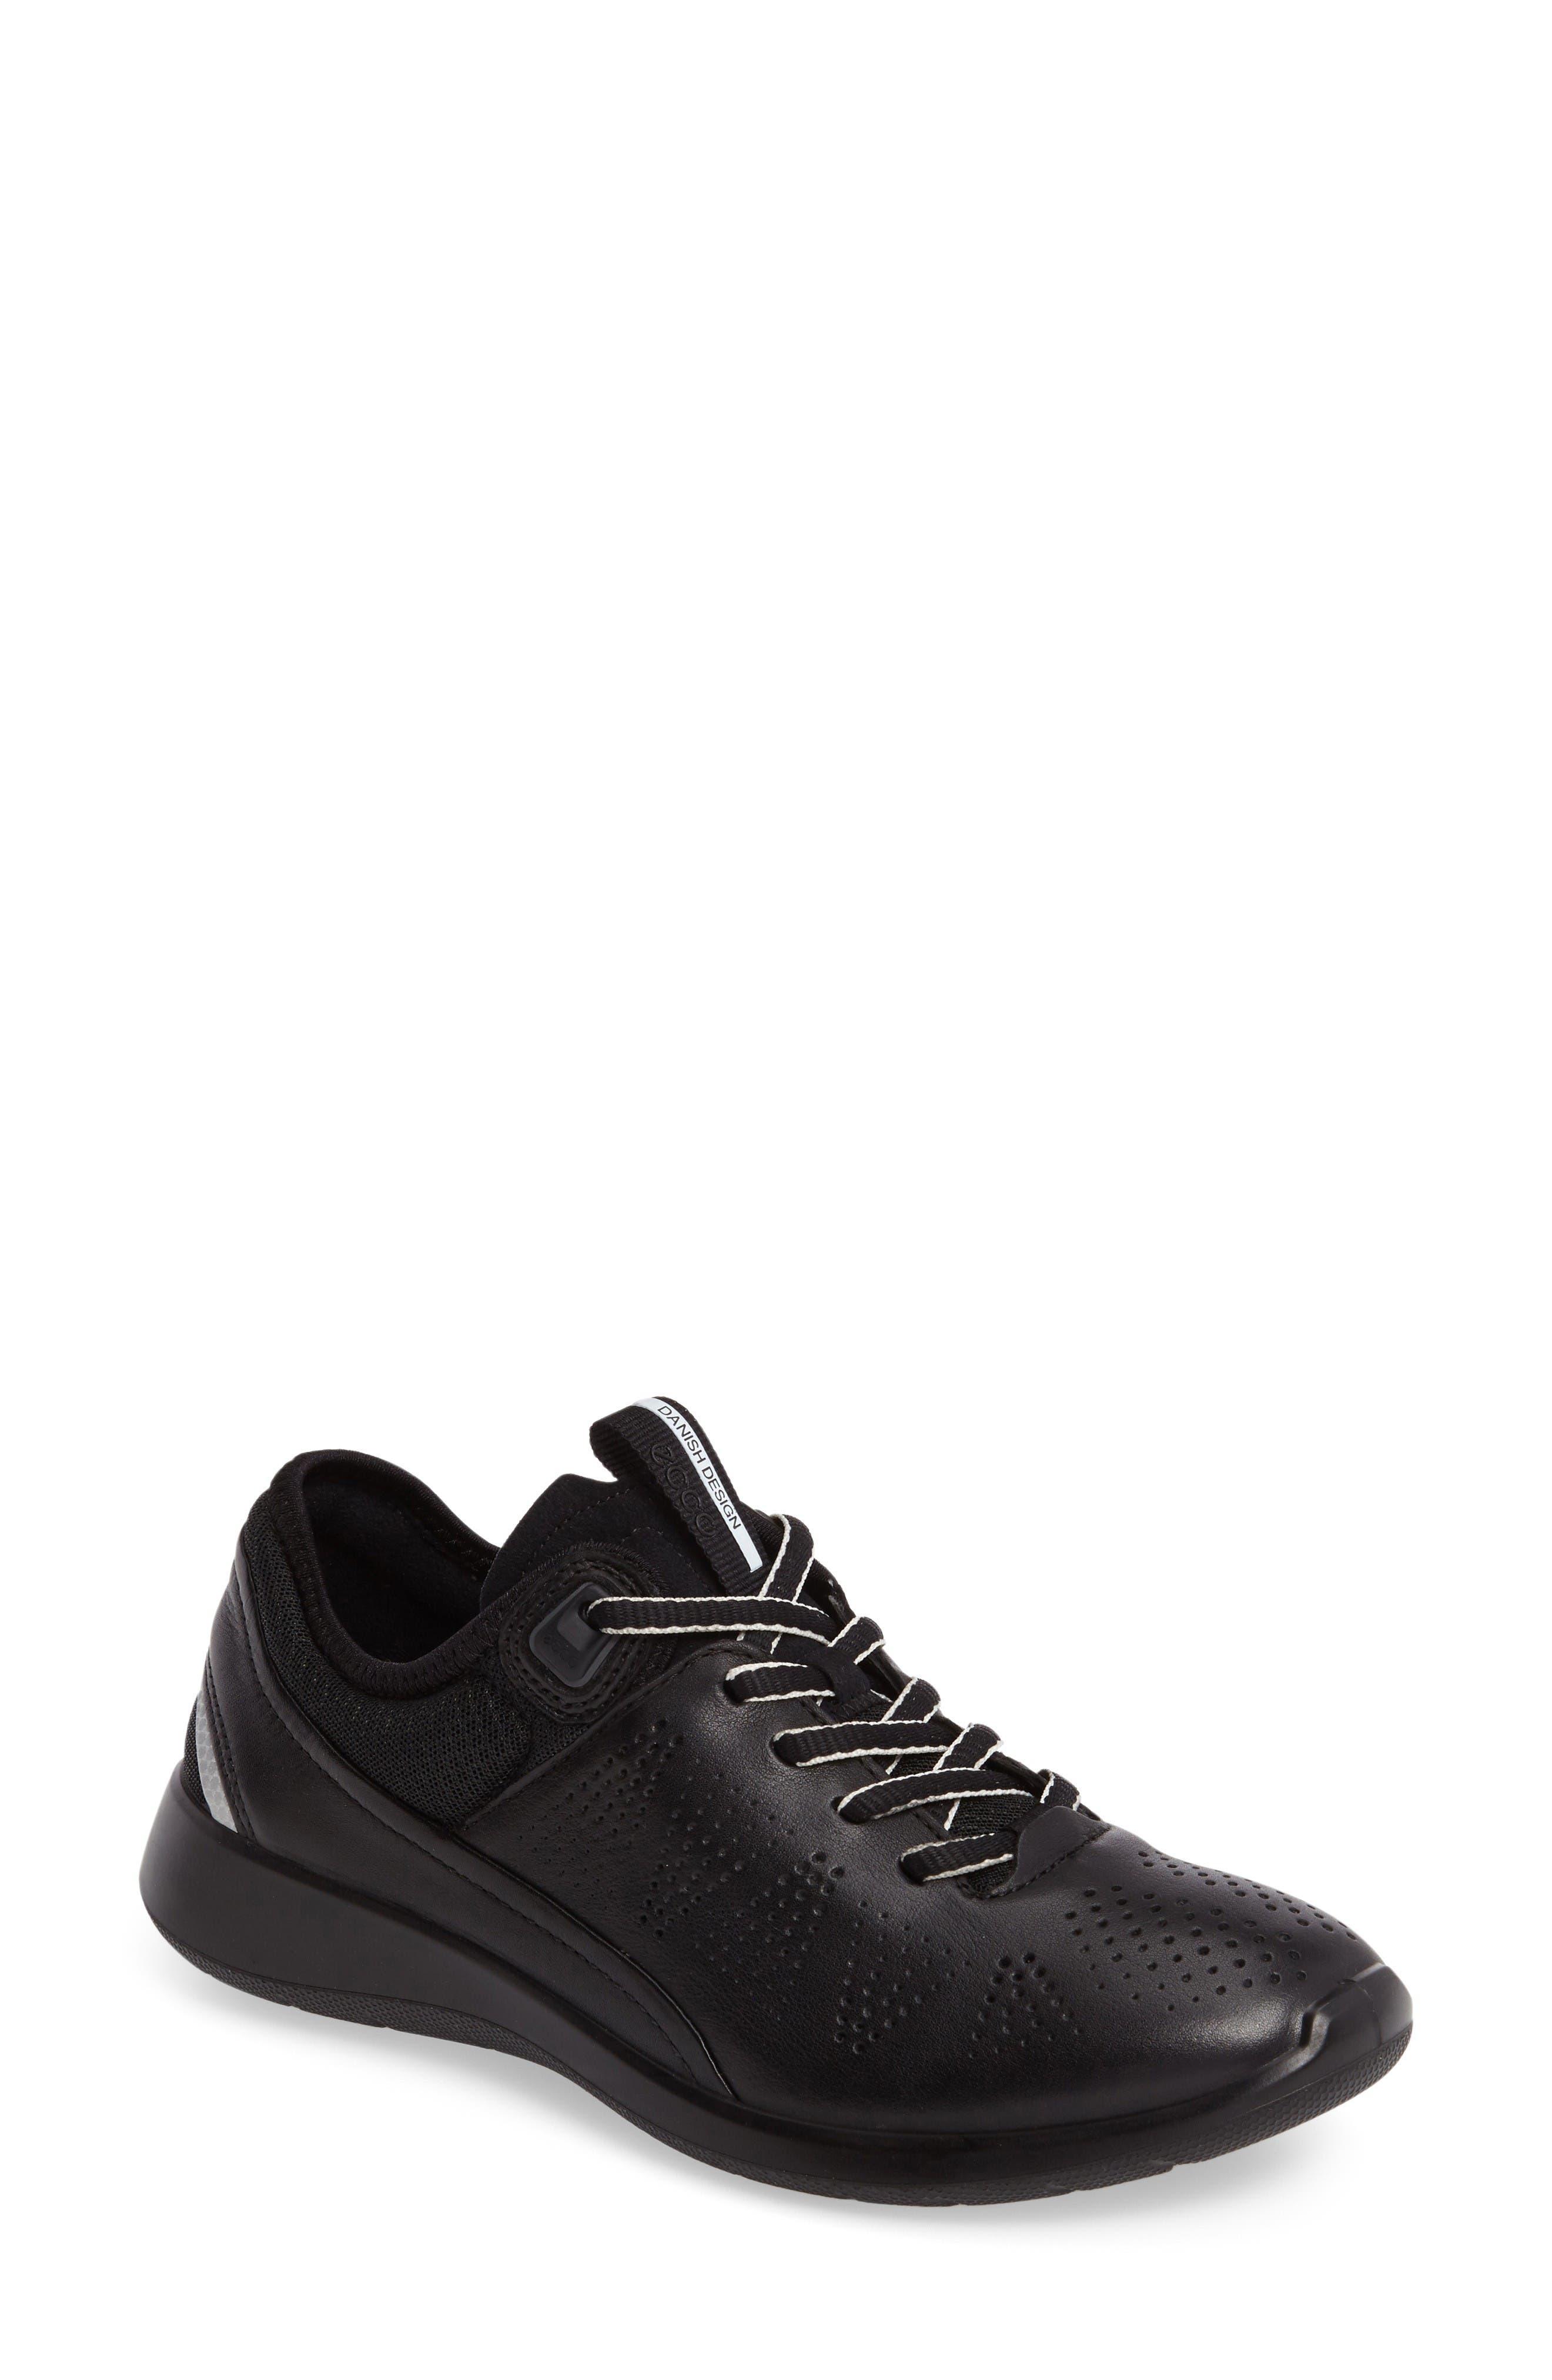 Main Image - ECCO Soft 5 Sneaker (Women)